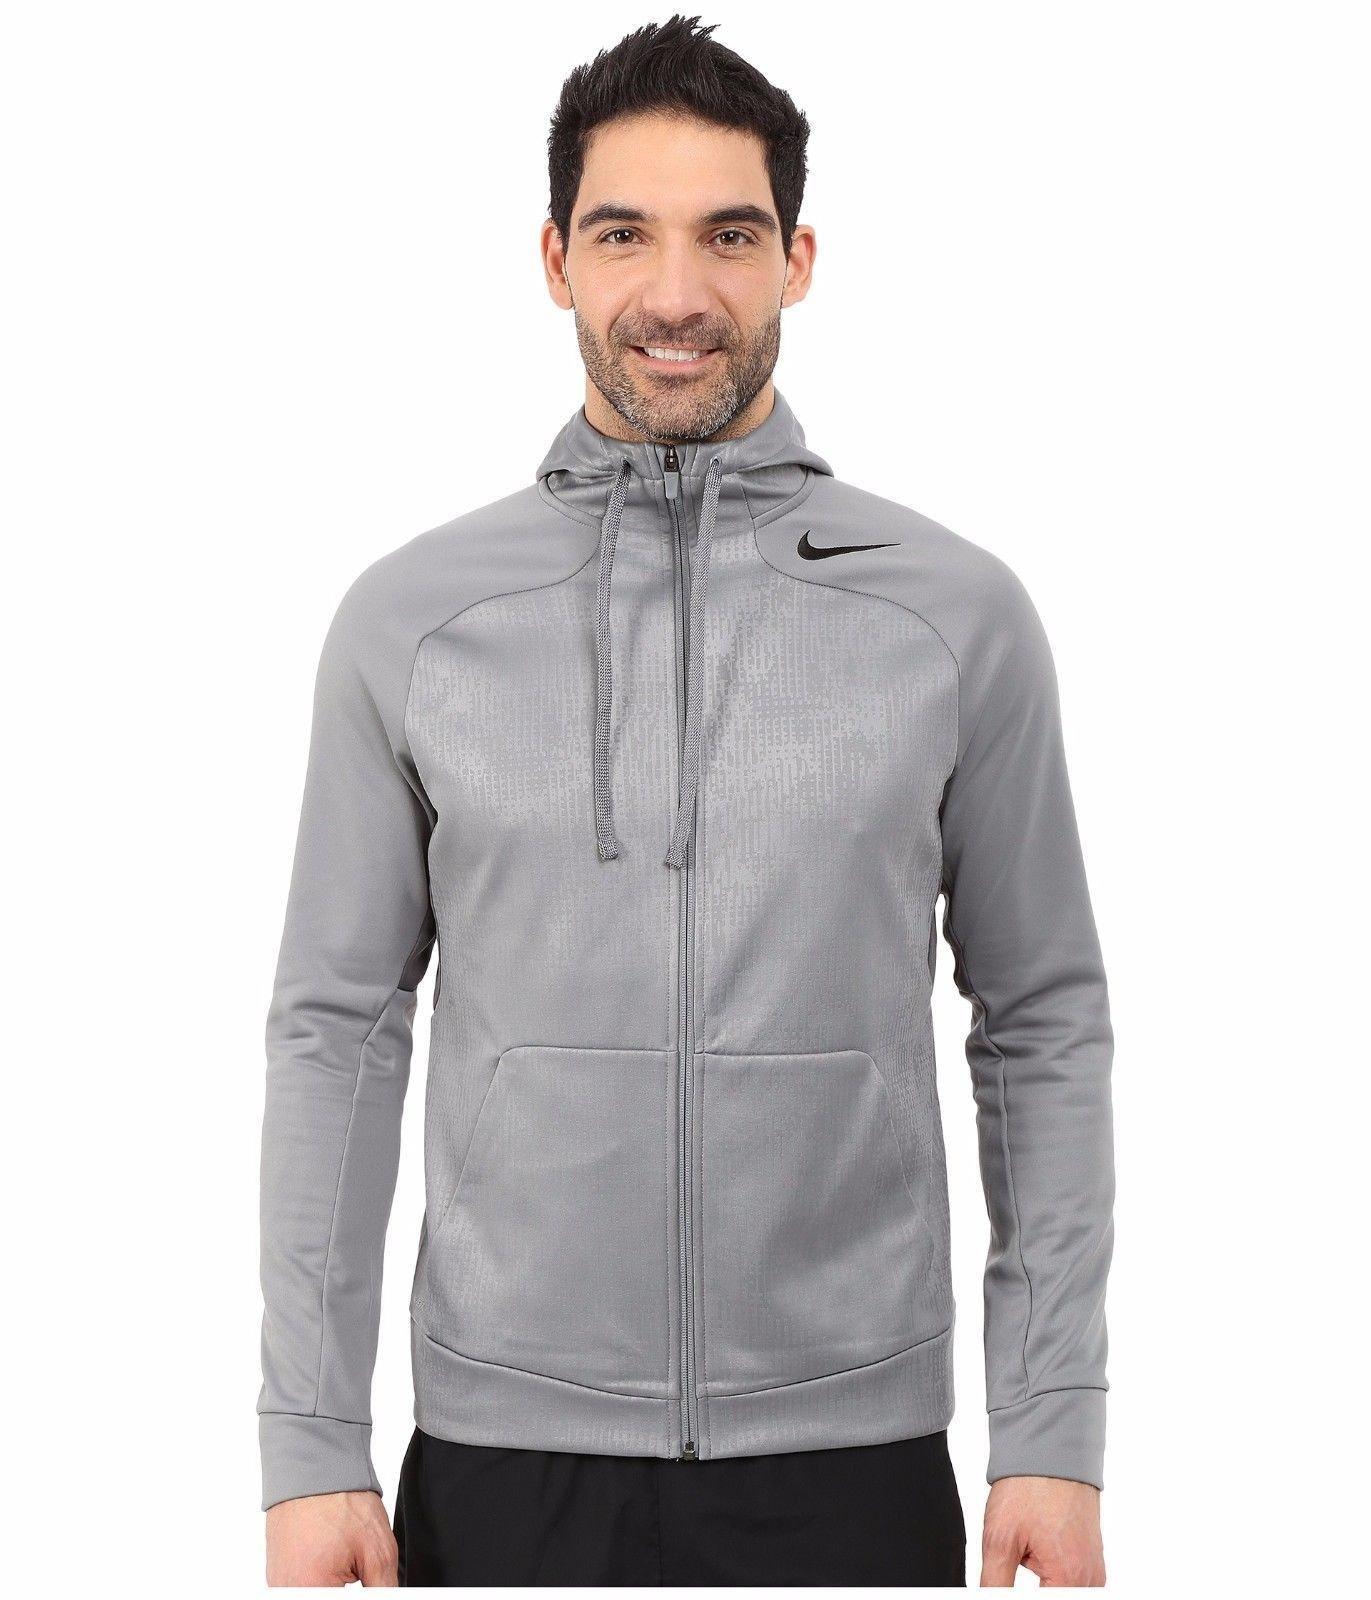 NIKE Men's Hyper Speed Fleece Full-Zip ThermaFit Training Hoodie 694093-065 (Size: Medium) Grey by NIKE